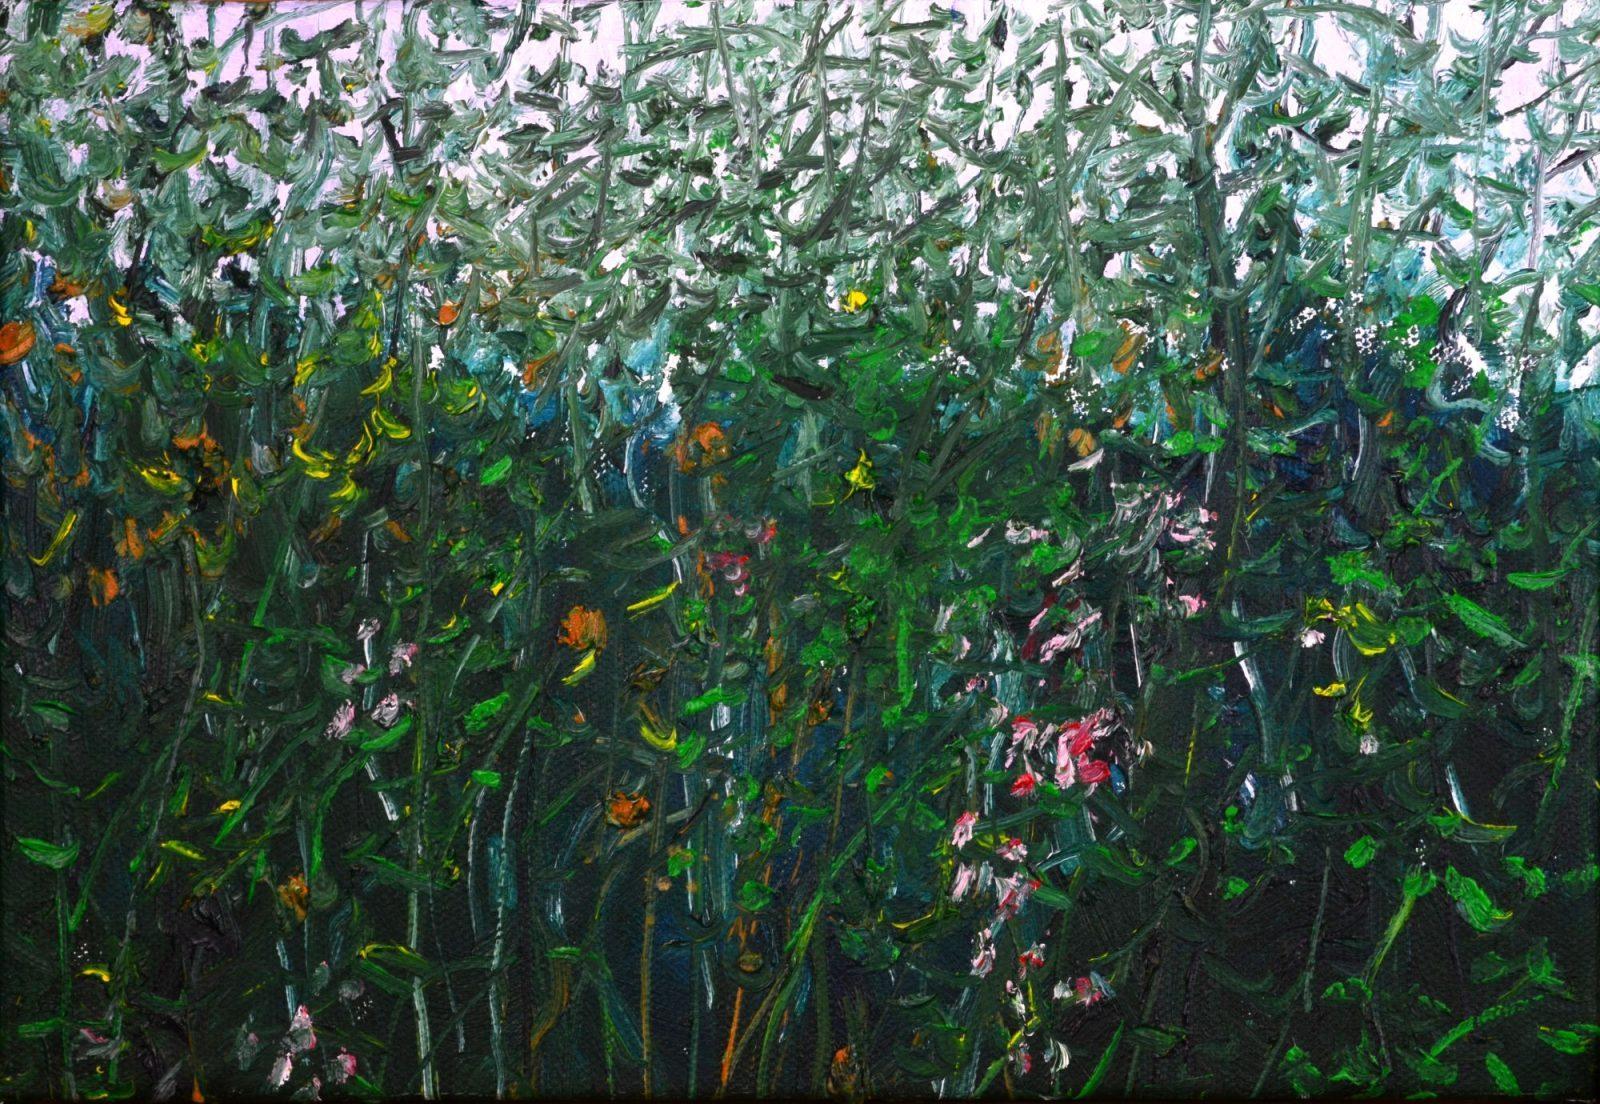 franyo aatoth: Garden Series 28.